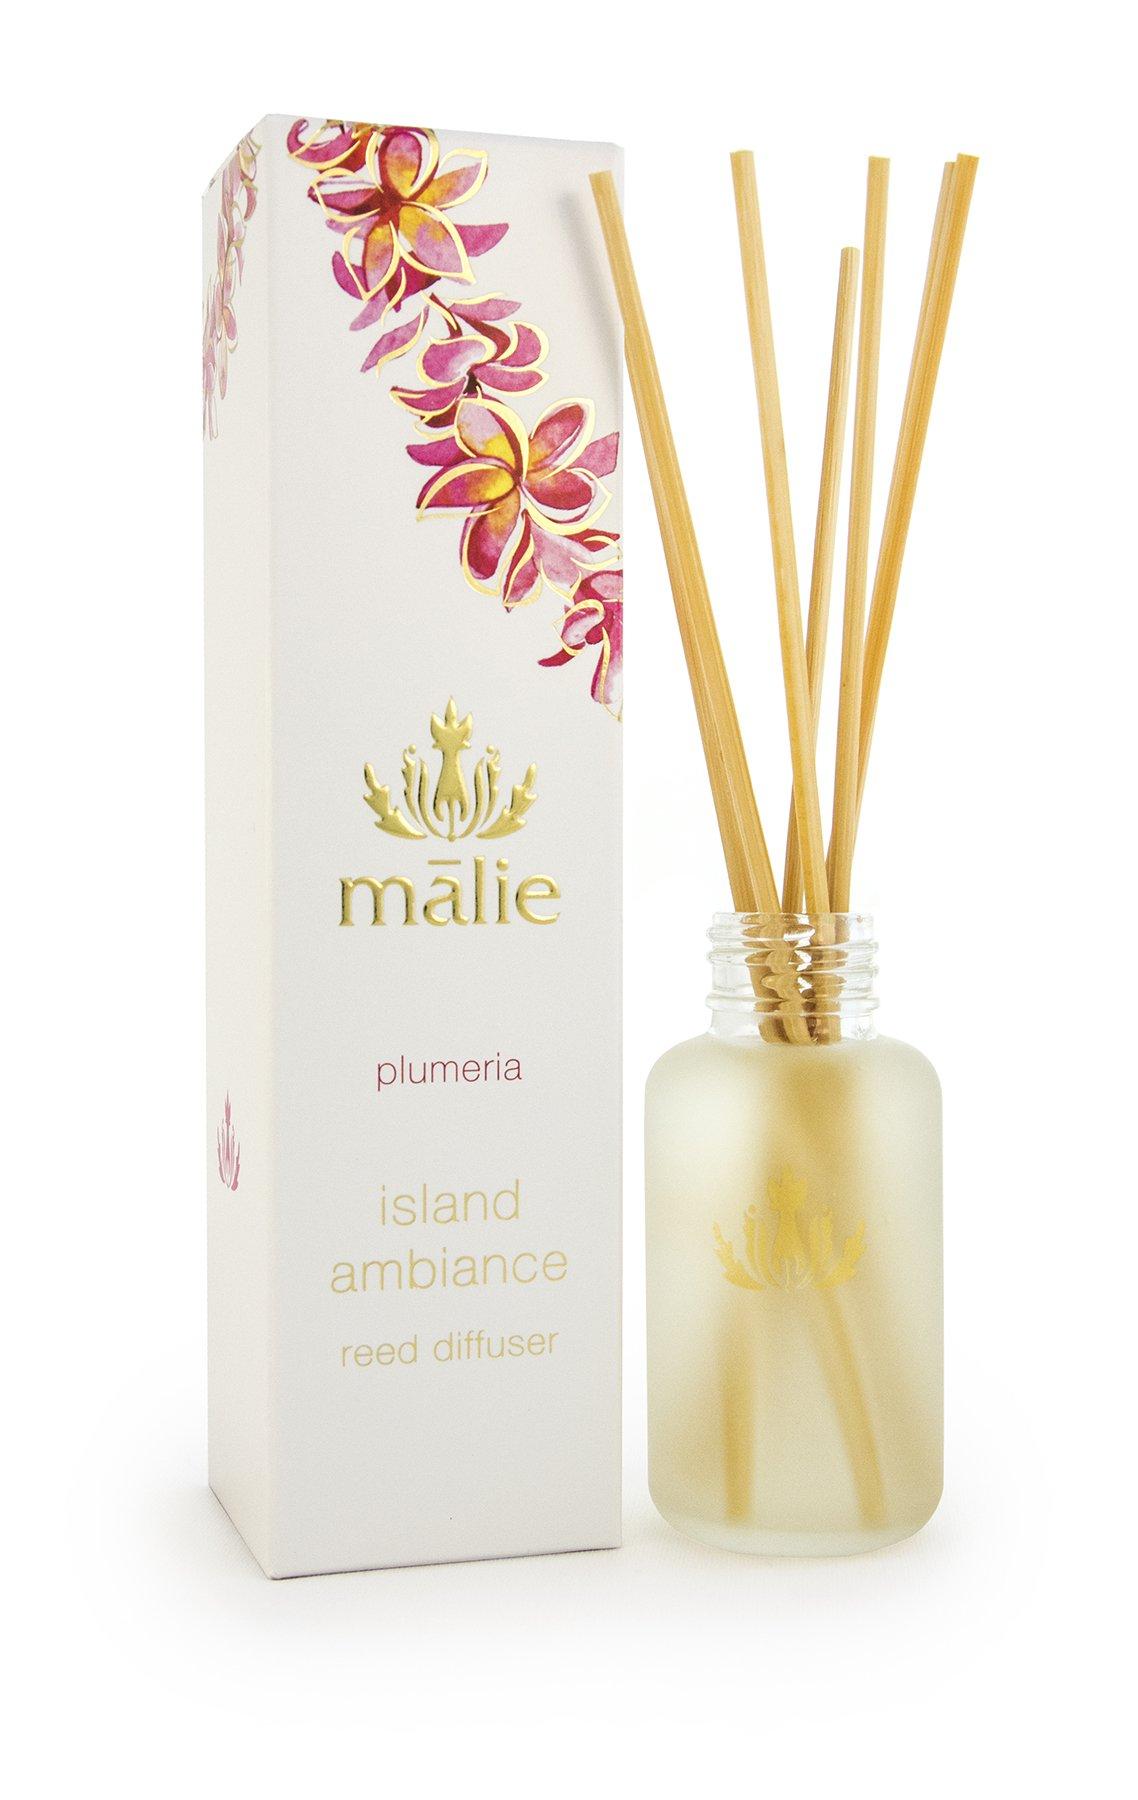 Malie Organics Malie Island Ambiance Reed Diffuser, Plumeria